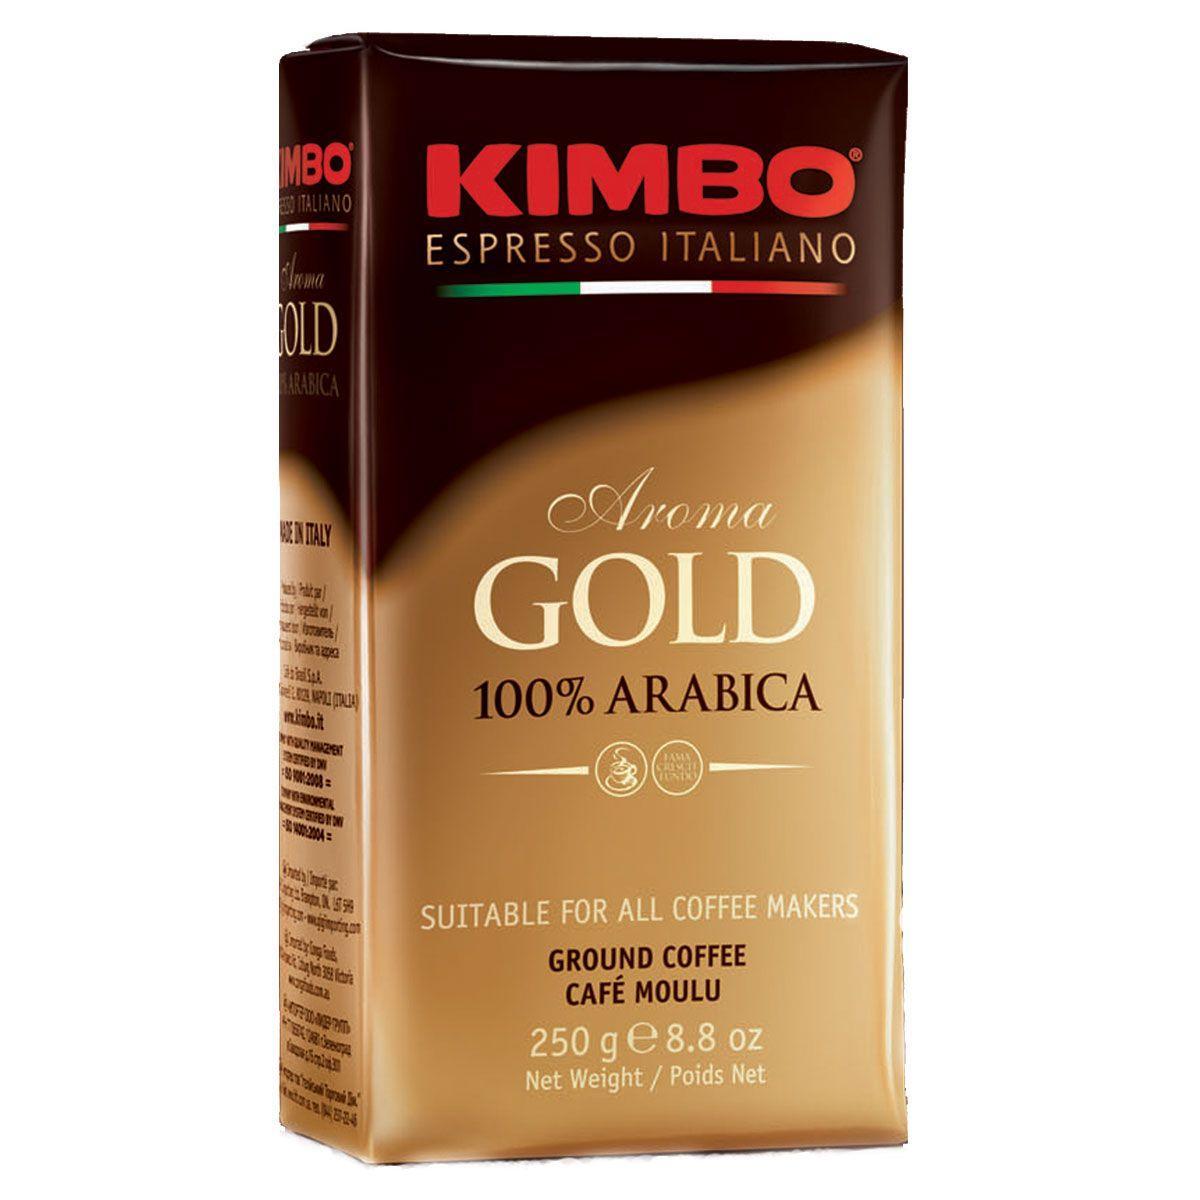 Кофе в зернах KIMBO AROMA GOLD 100% ARABICA , 250 грамм.  Италия